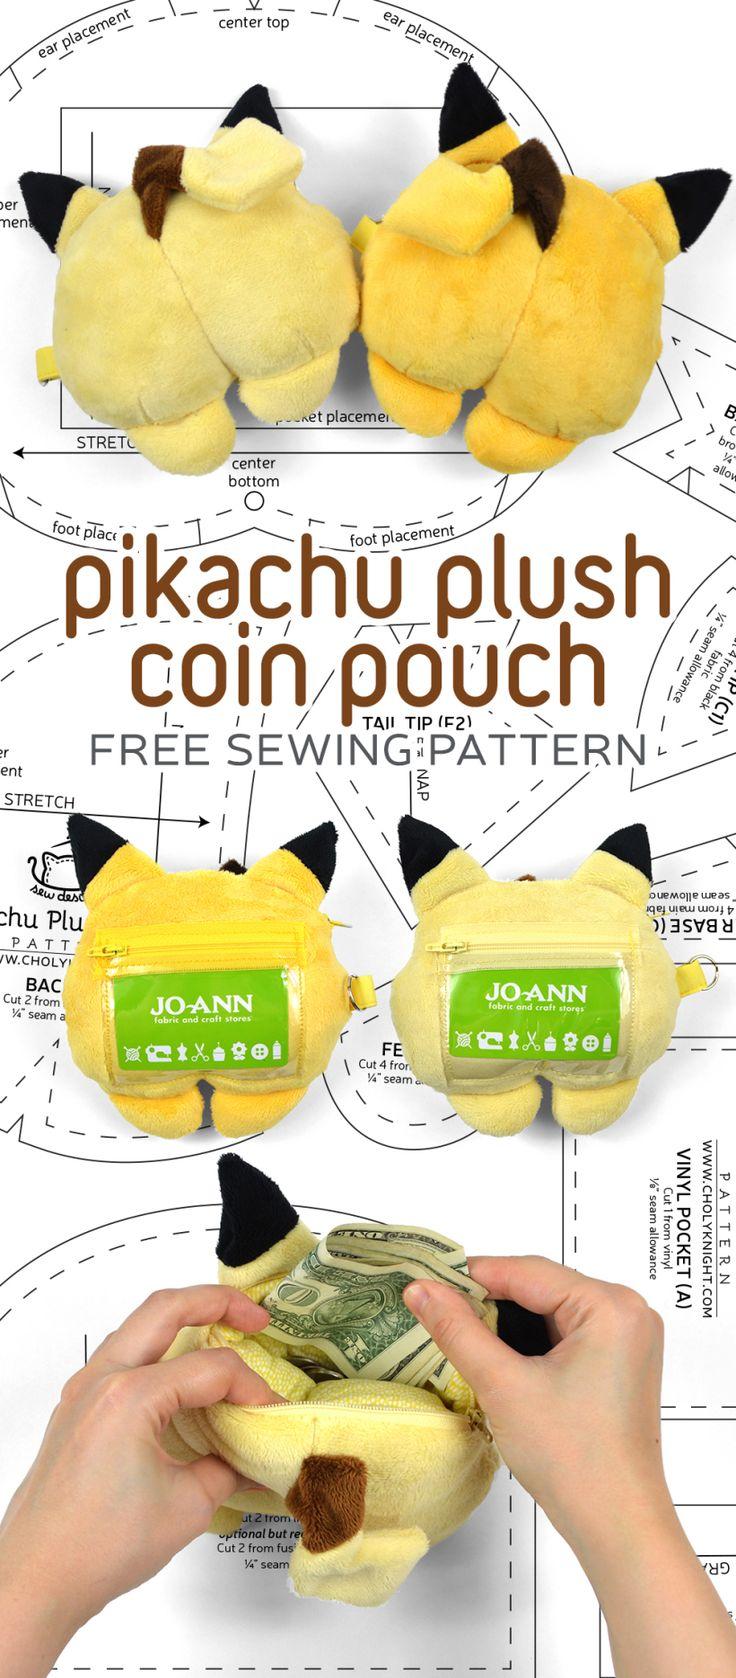 Free sewing pattern: Make a cute plush coin pouch shaped like a Pikachu butt! Ha…